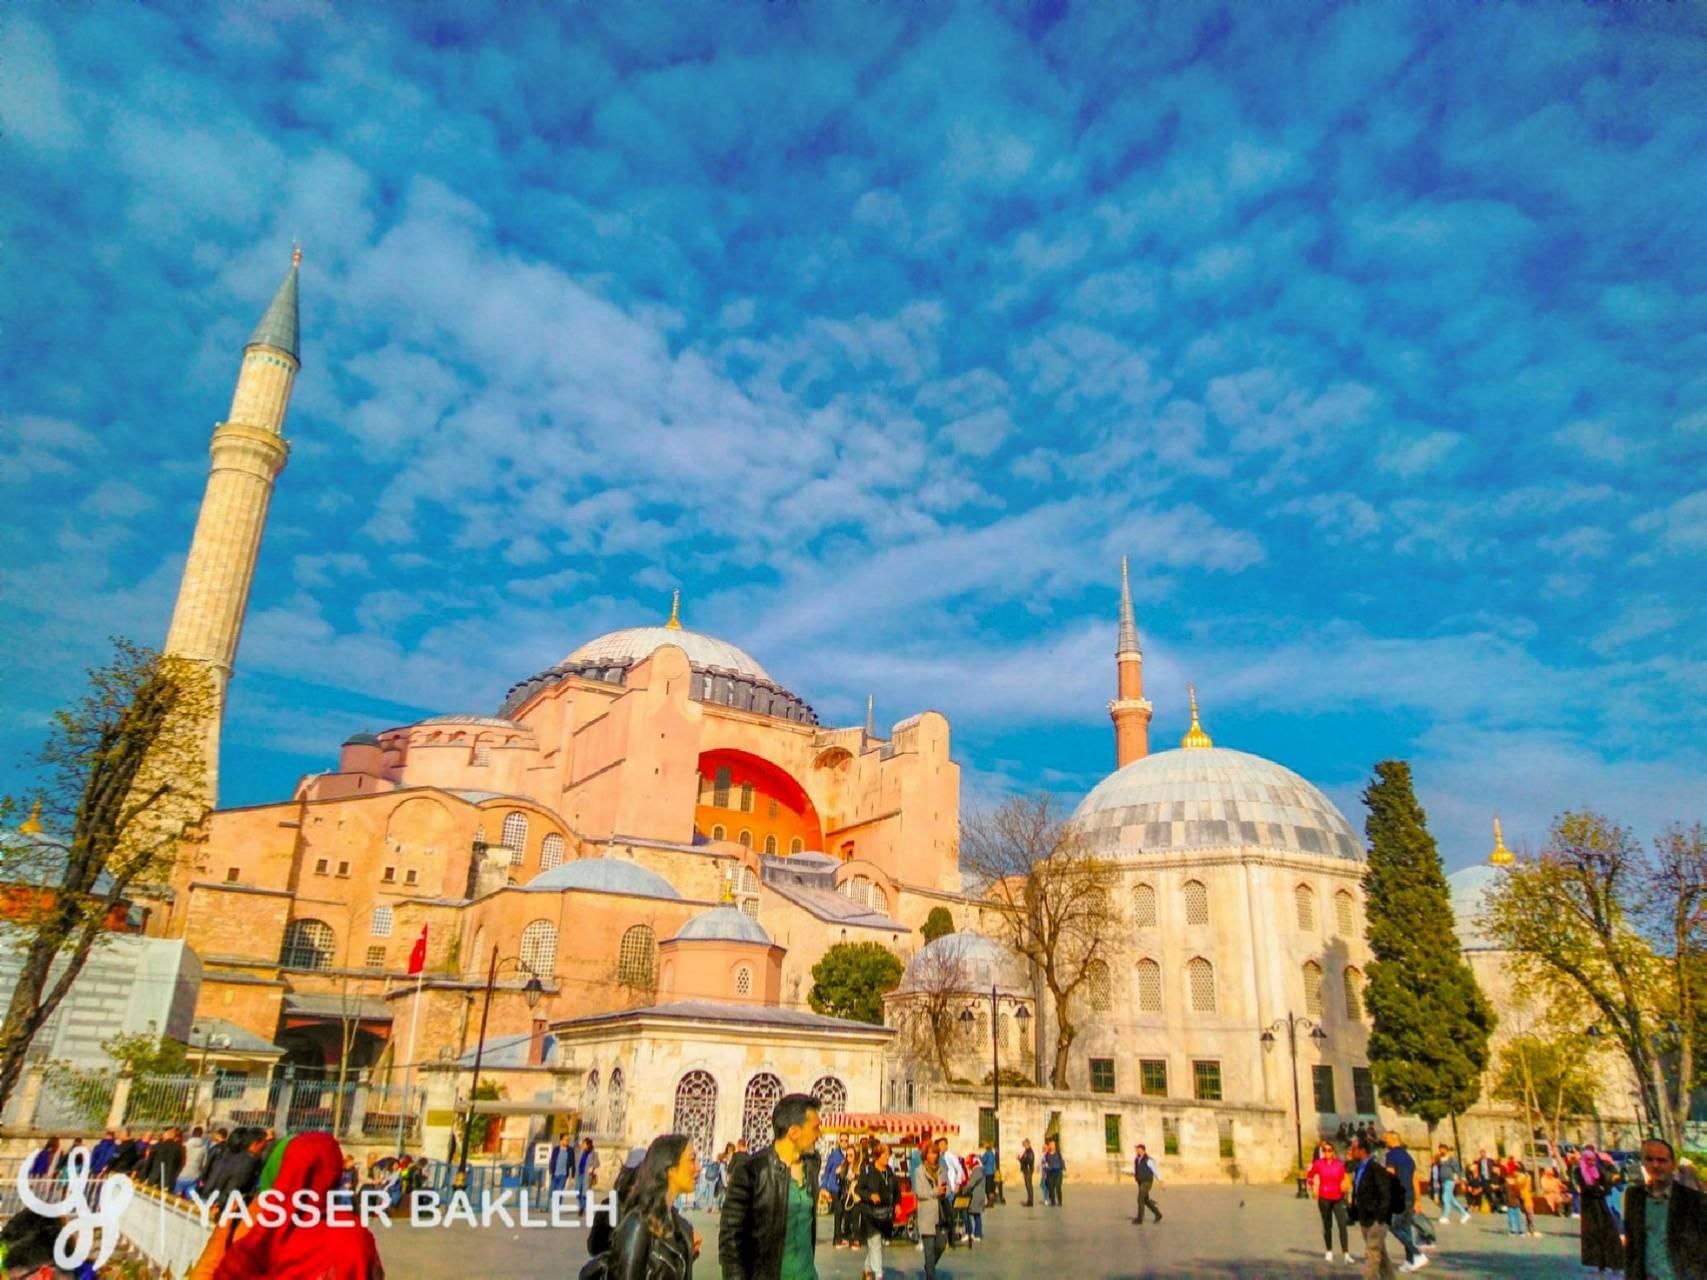 YAB mosque 1